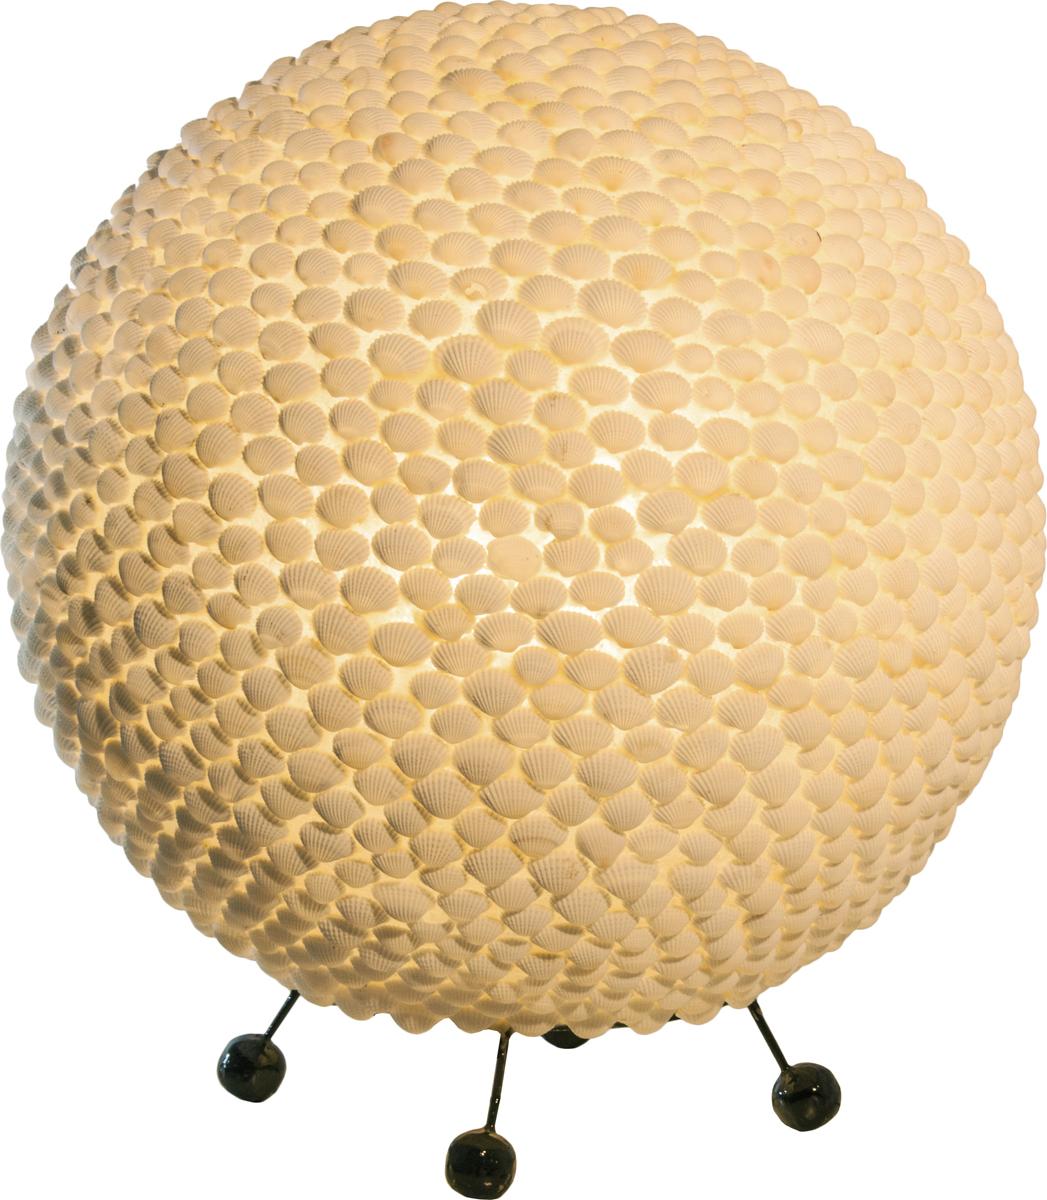 Лампа настольная Globo Bali. 25835 настольная лампа декоративная globo bali 25835